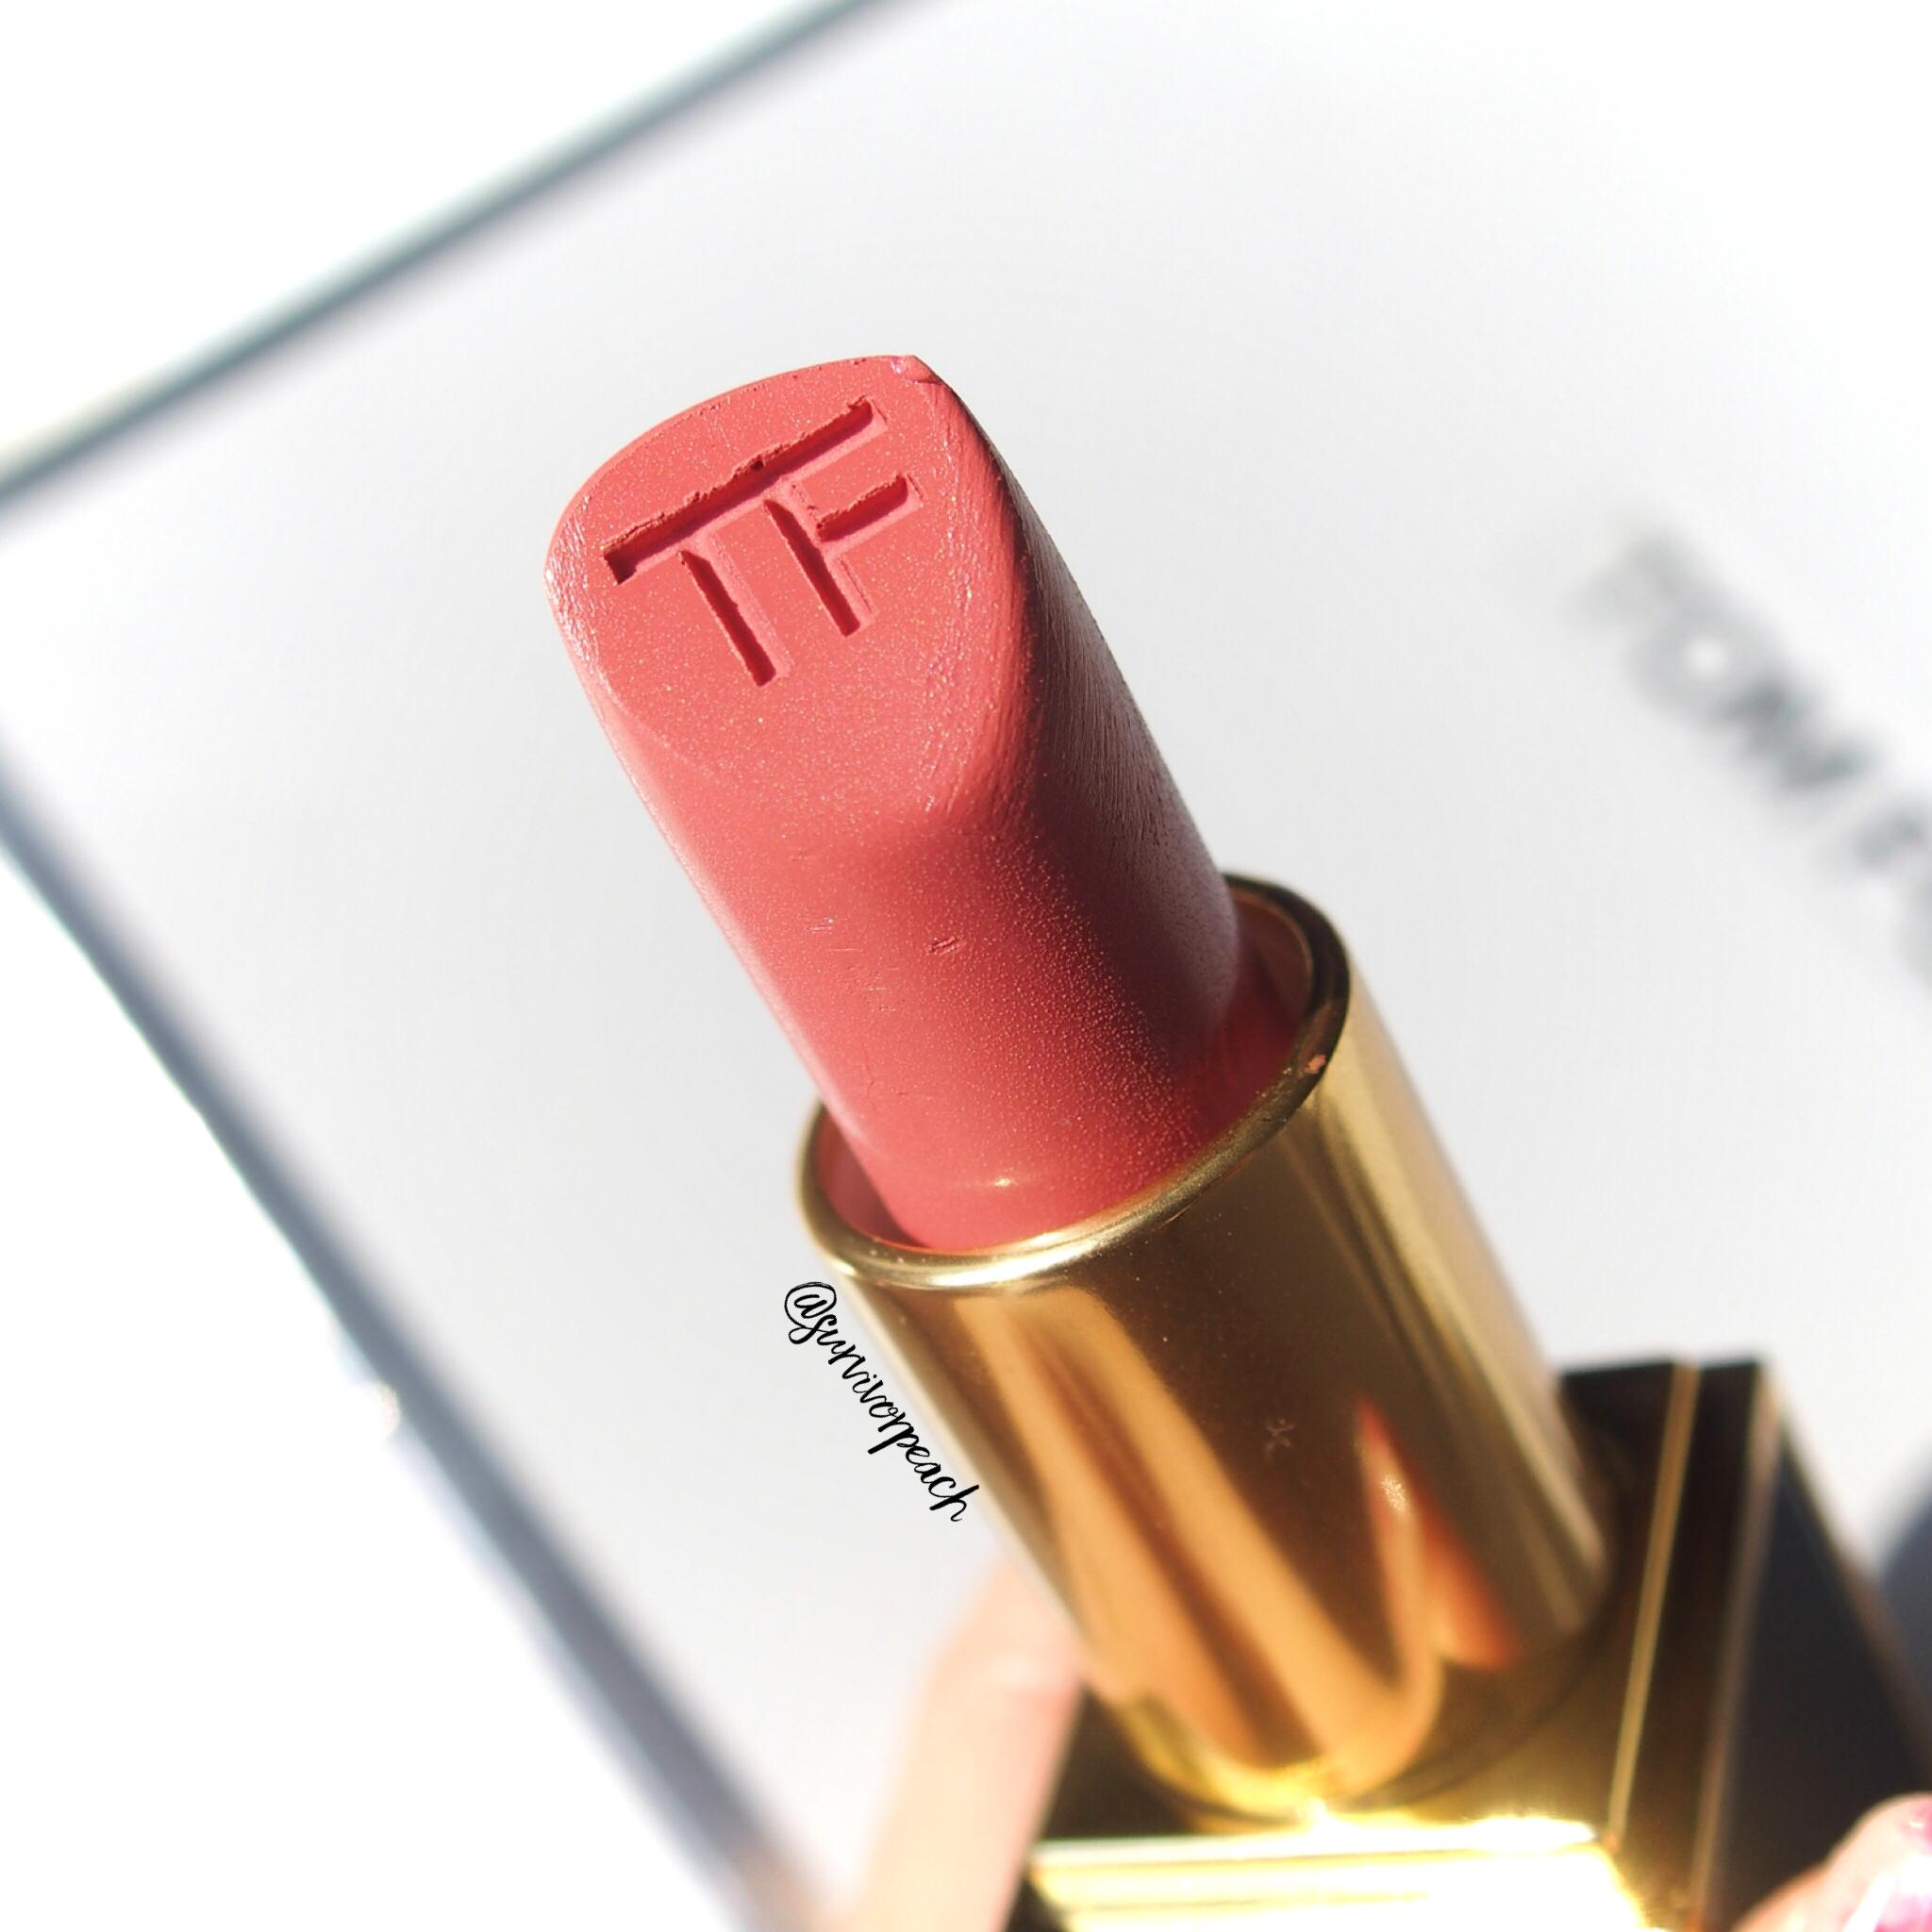 Tom Ford Lipsticks in Misbehaved